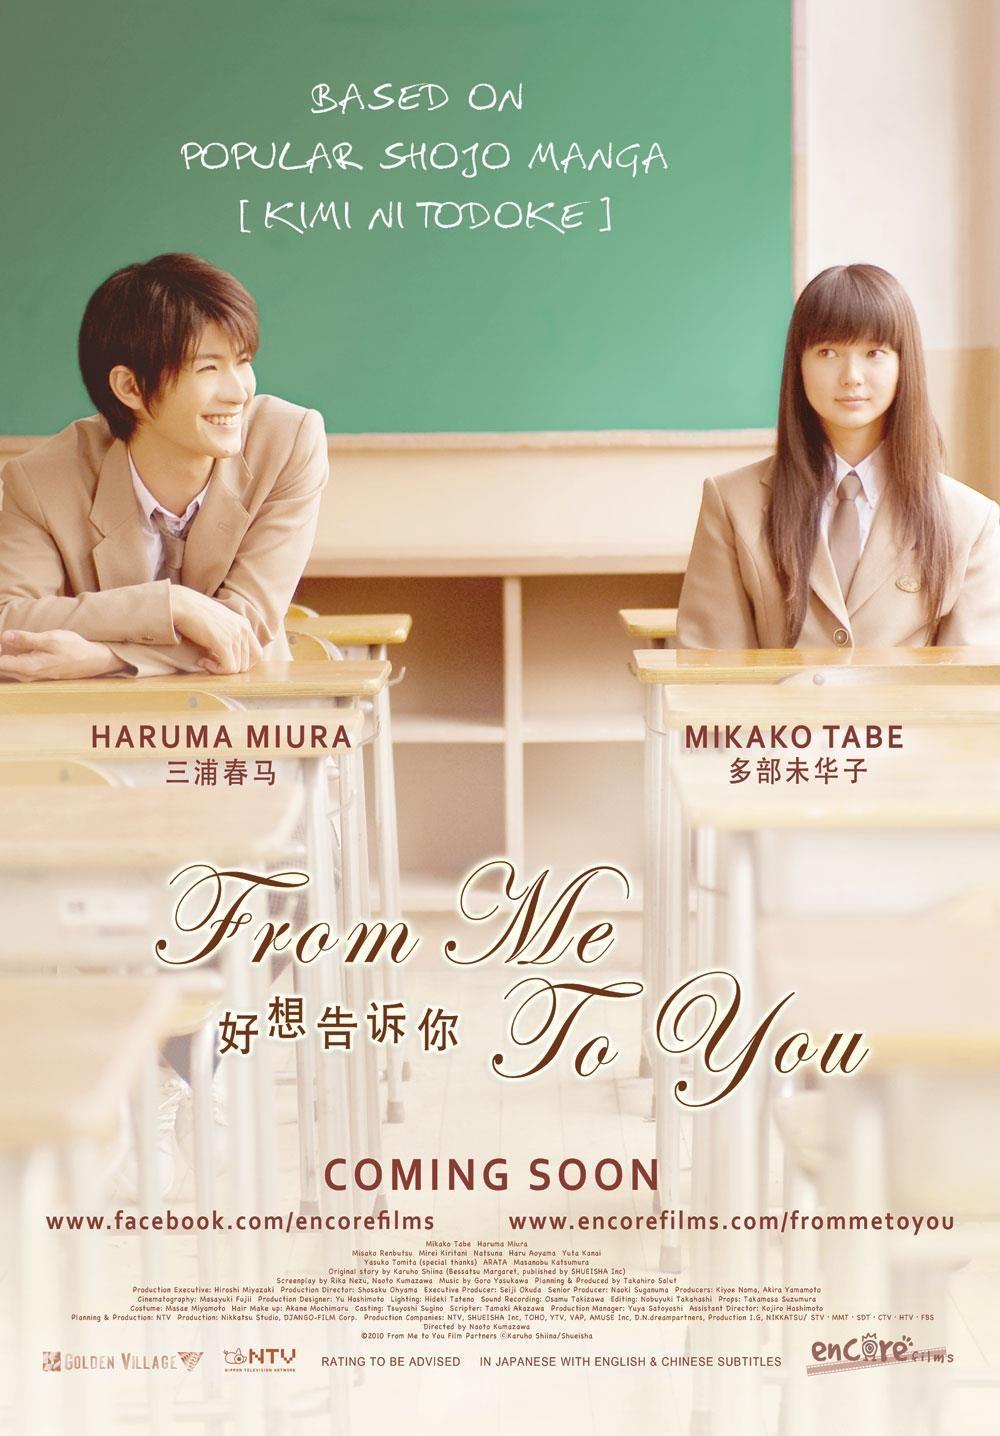 Kimi ni Todoke Live Action Film Promotional Poster (2010